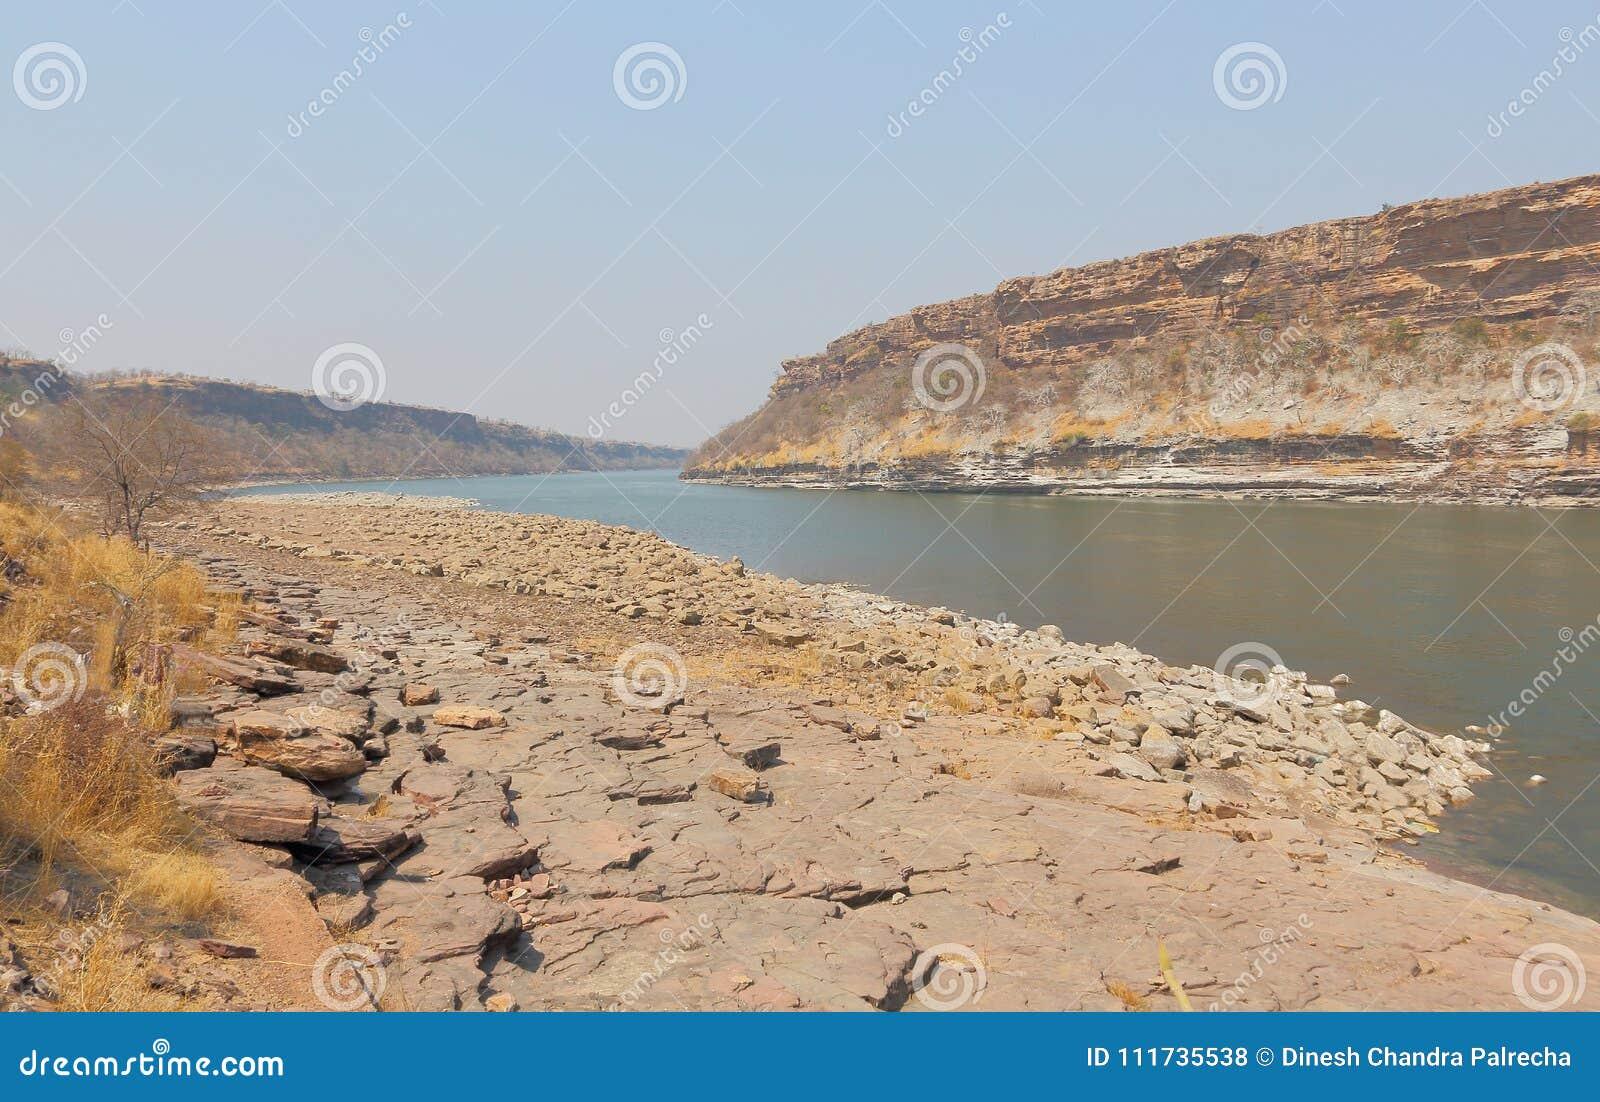 Chambal-Fluss an gandhi sagar Verdammung, Madhya Pradesh, Indien